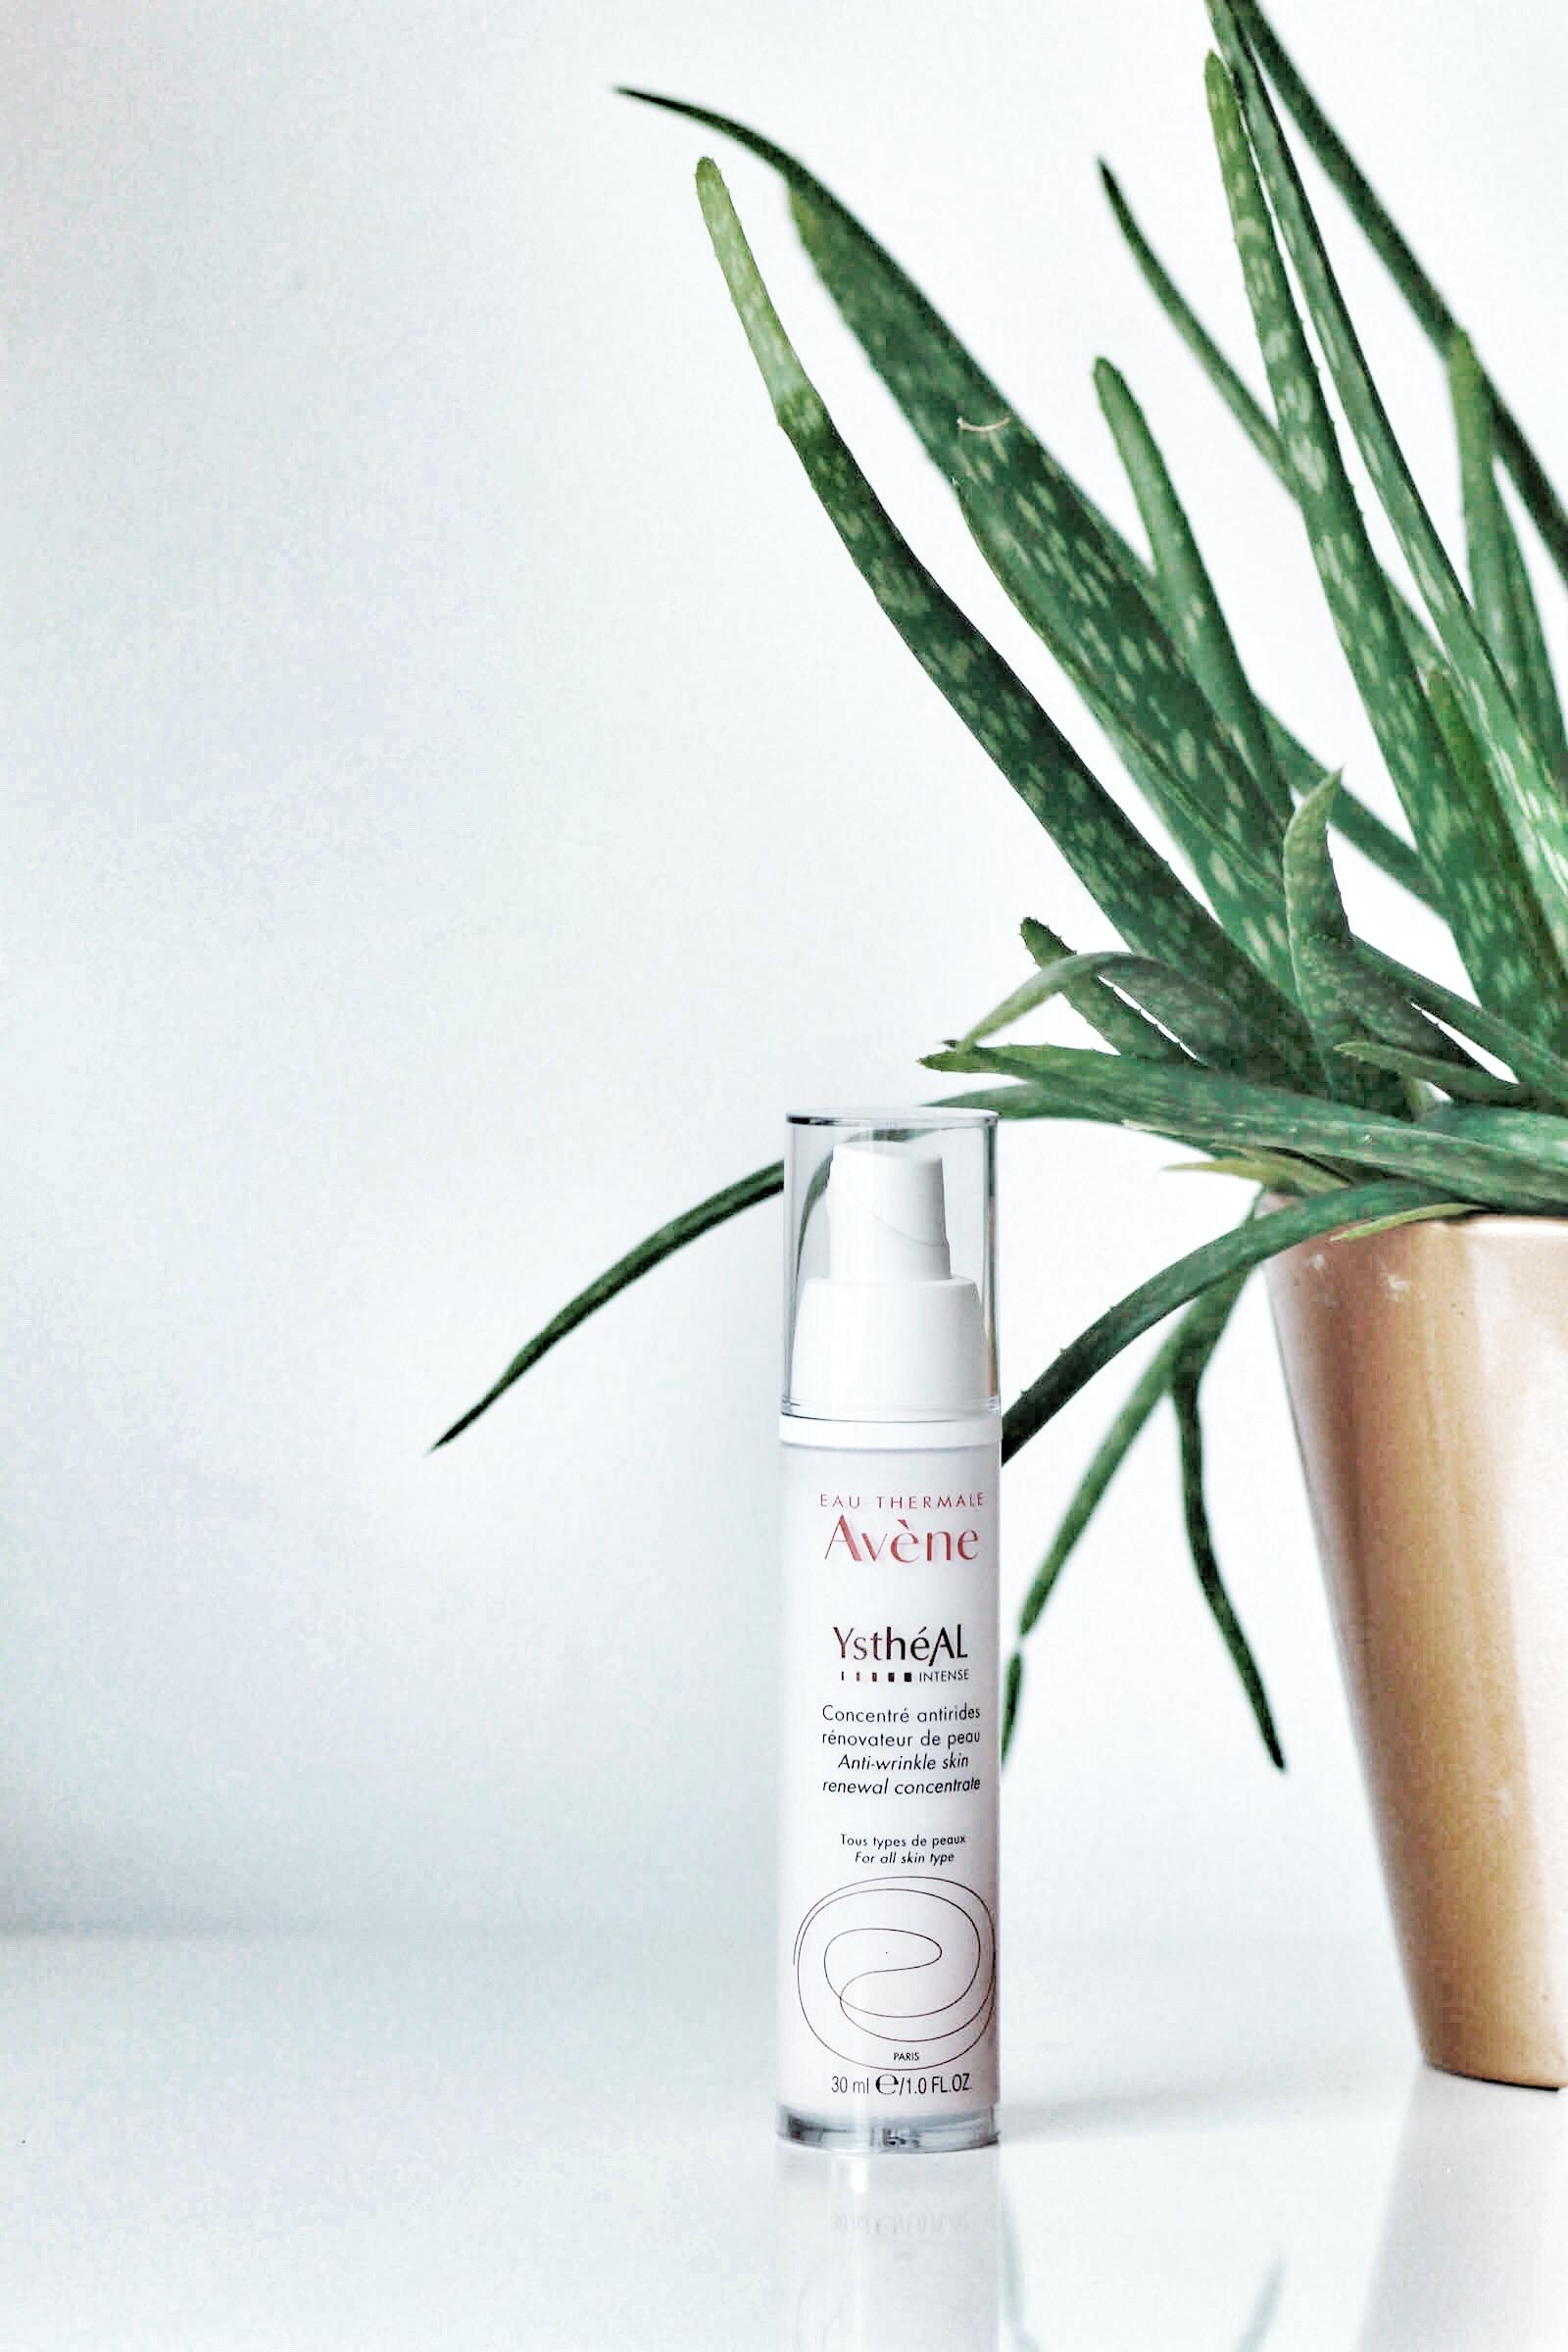 Avène YsthéAL Intense chemical peel cream